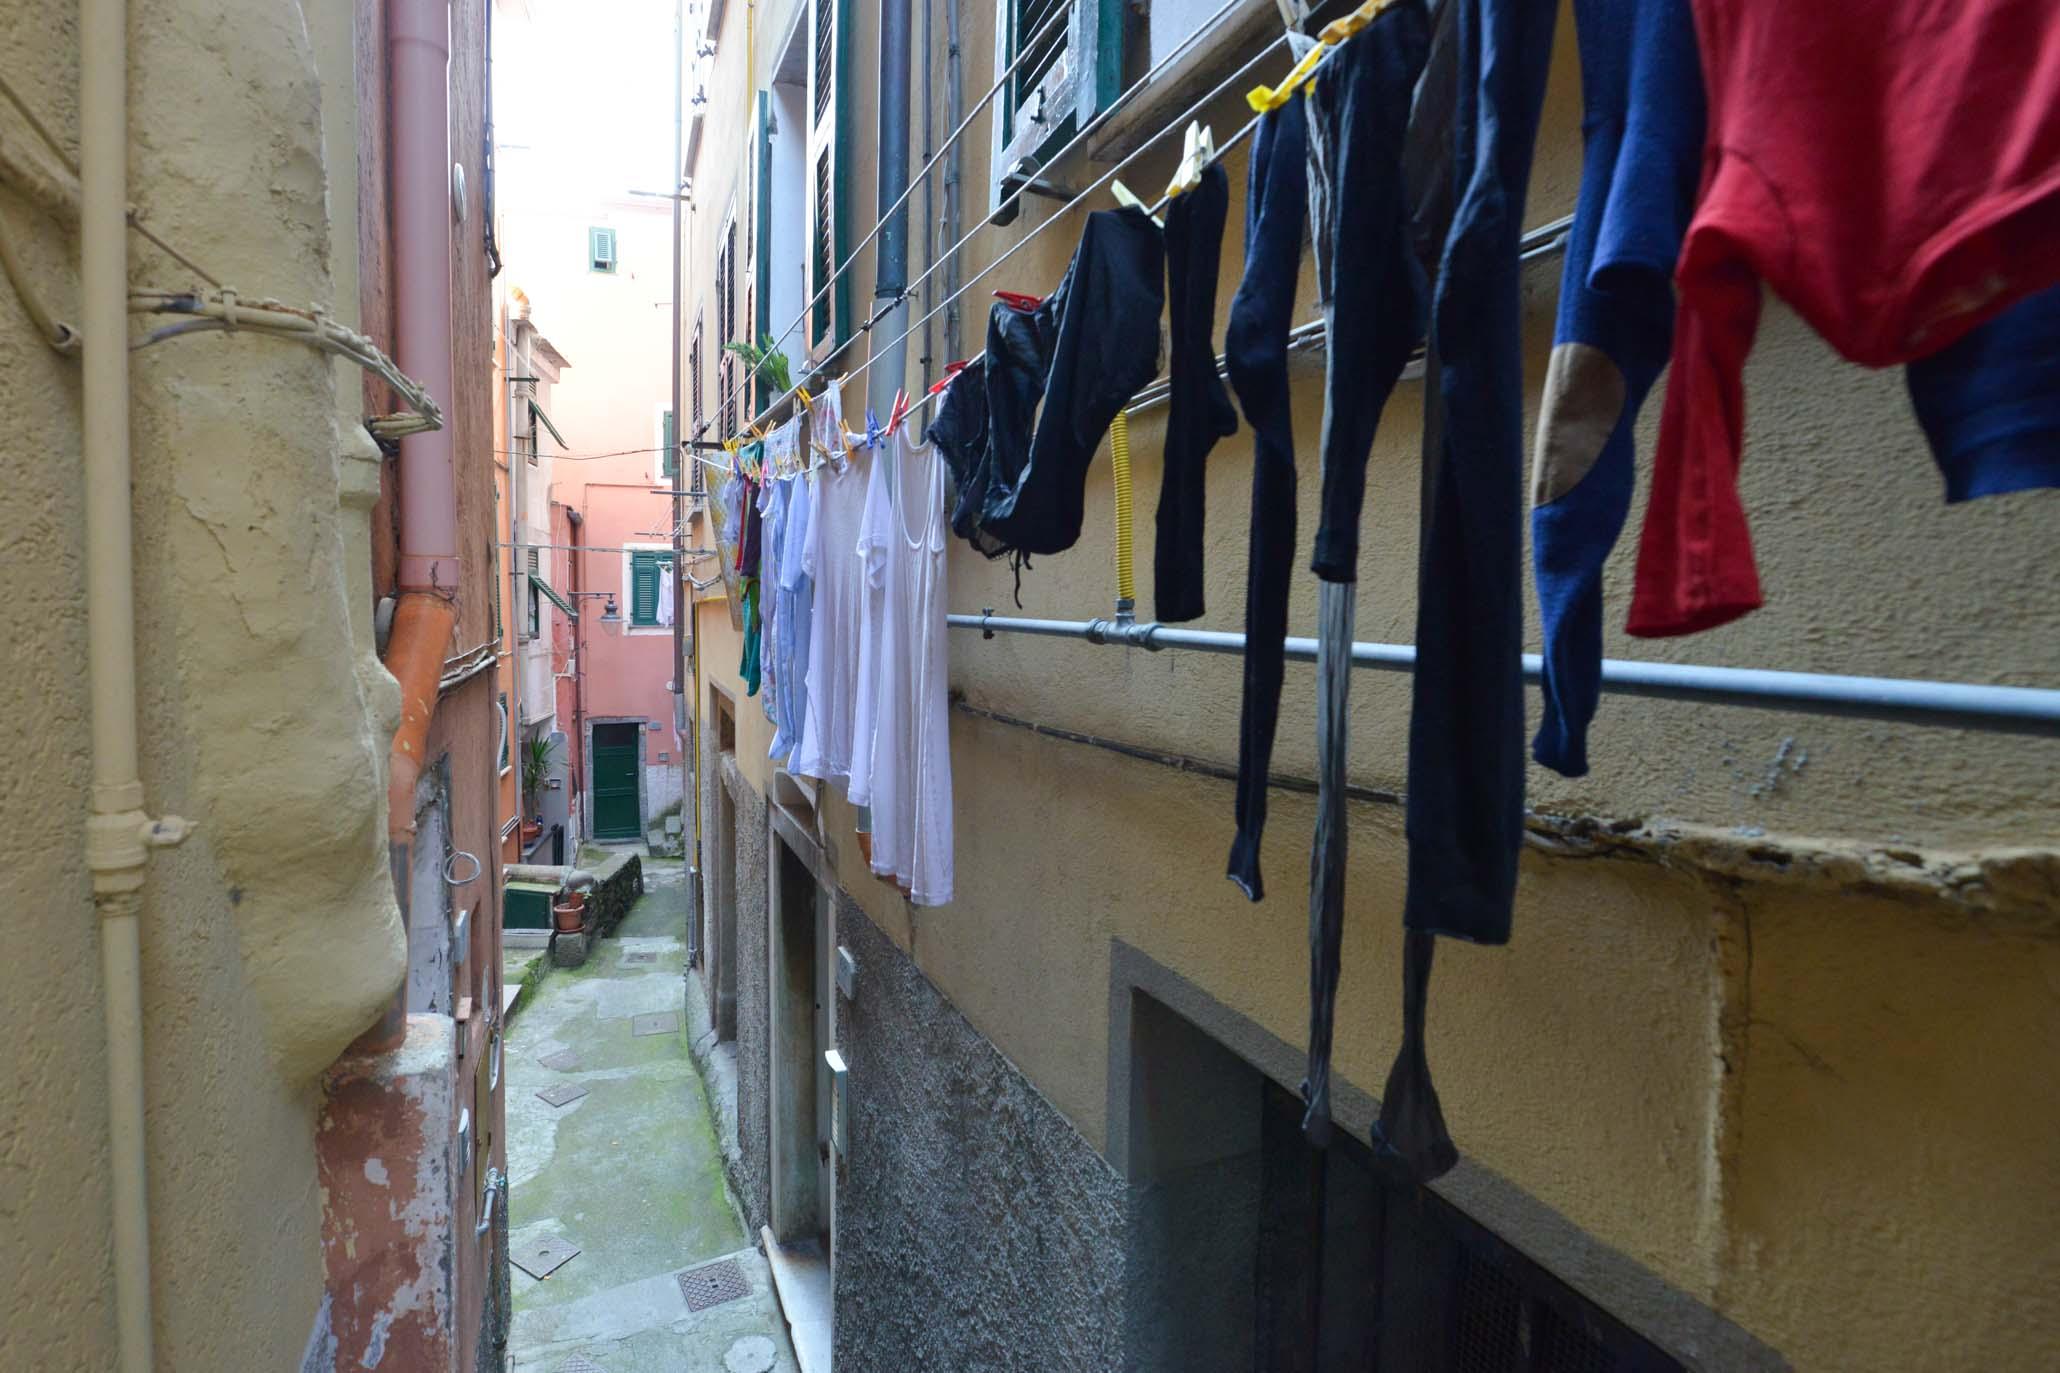 Cinque Terre, Riomaggiore Clothes hanging to dry small alley